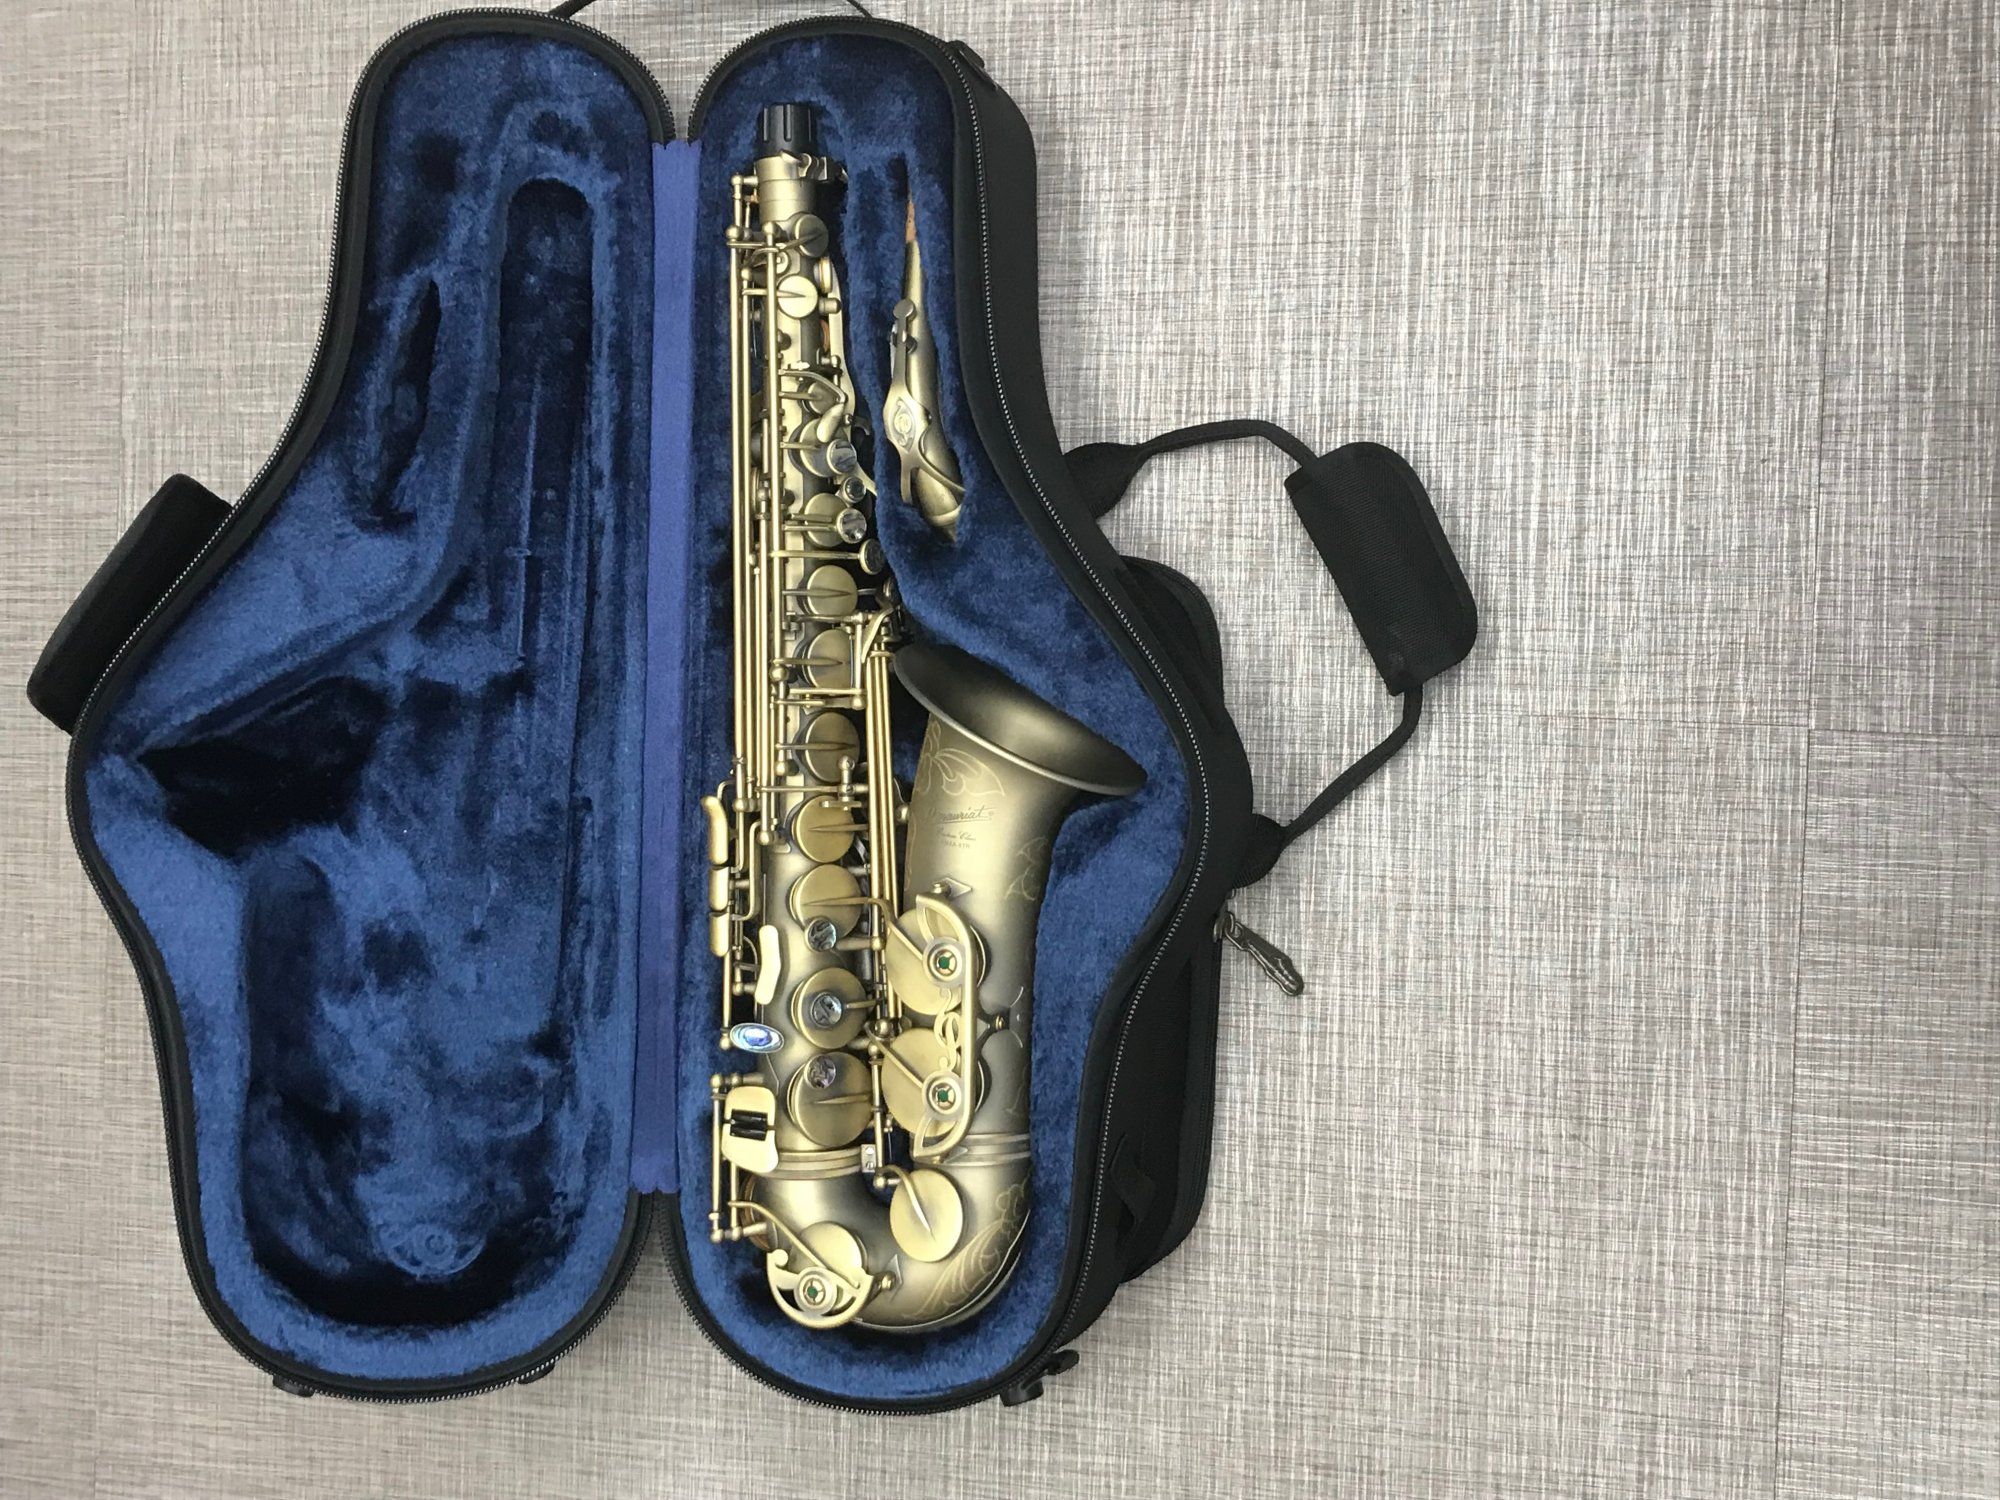 P. Mauriat PMXA-67RDK Alto Saxophone Professional Matte Lacquer - DEMO